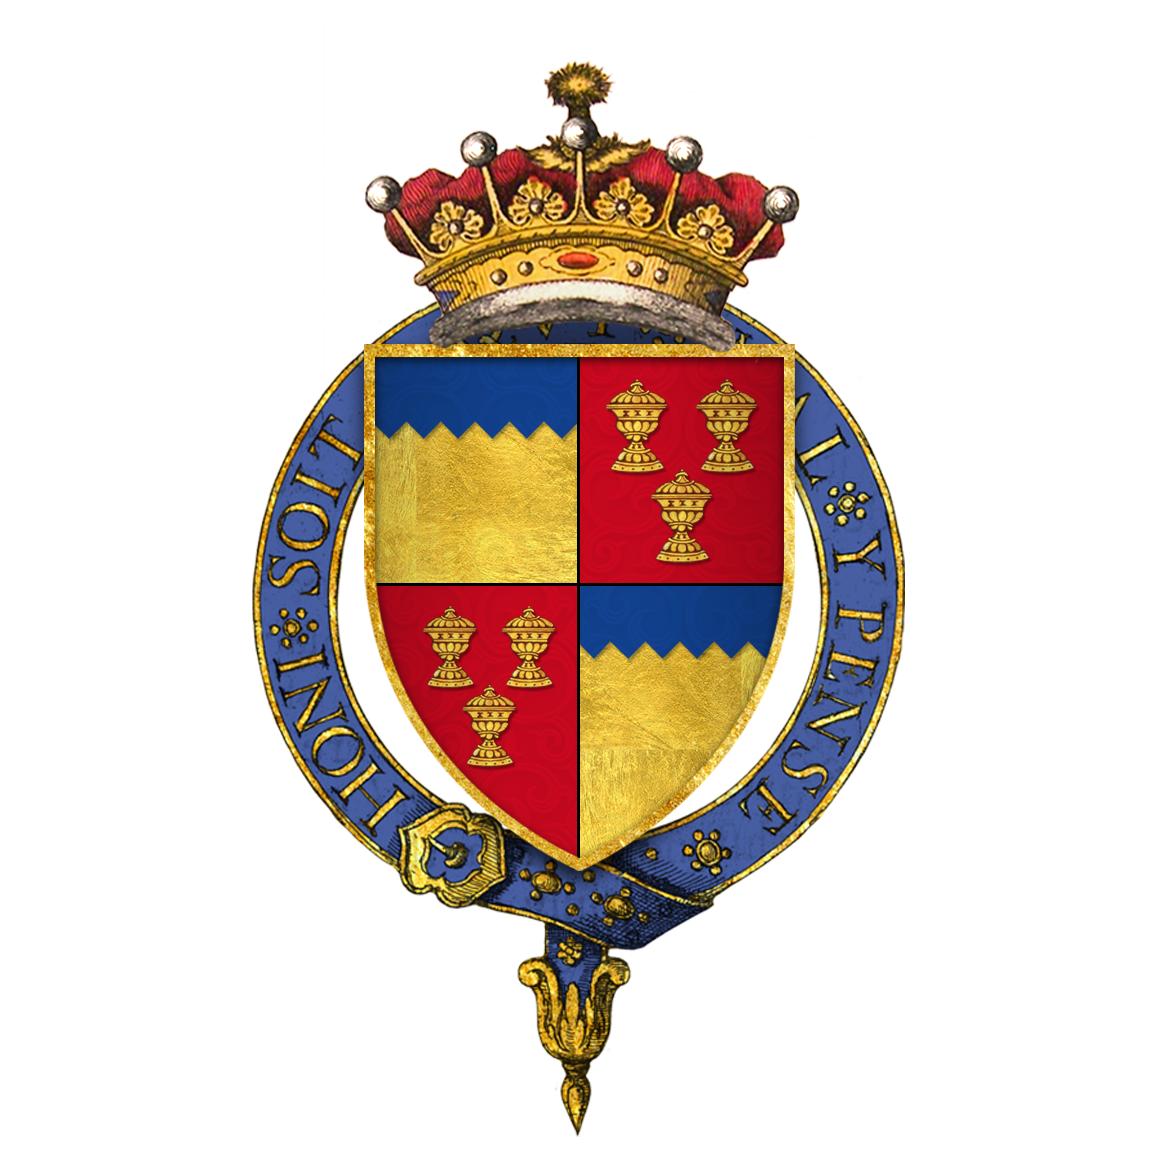 James Butler, 5th Earl Of Ormond